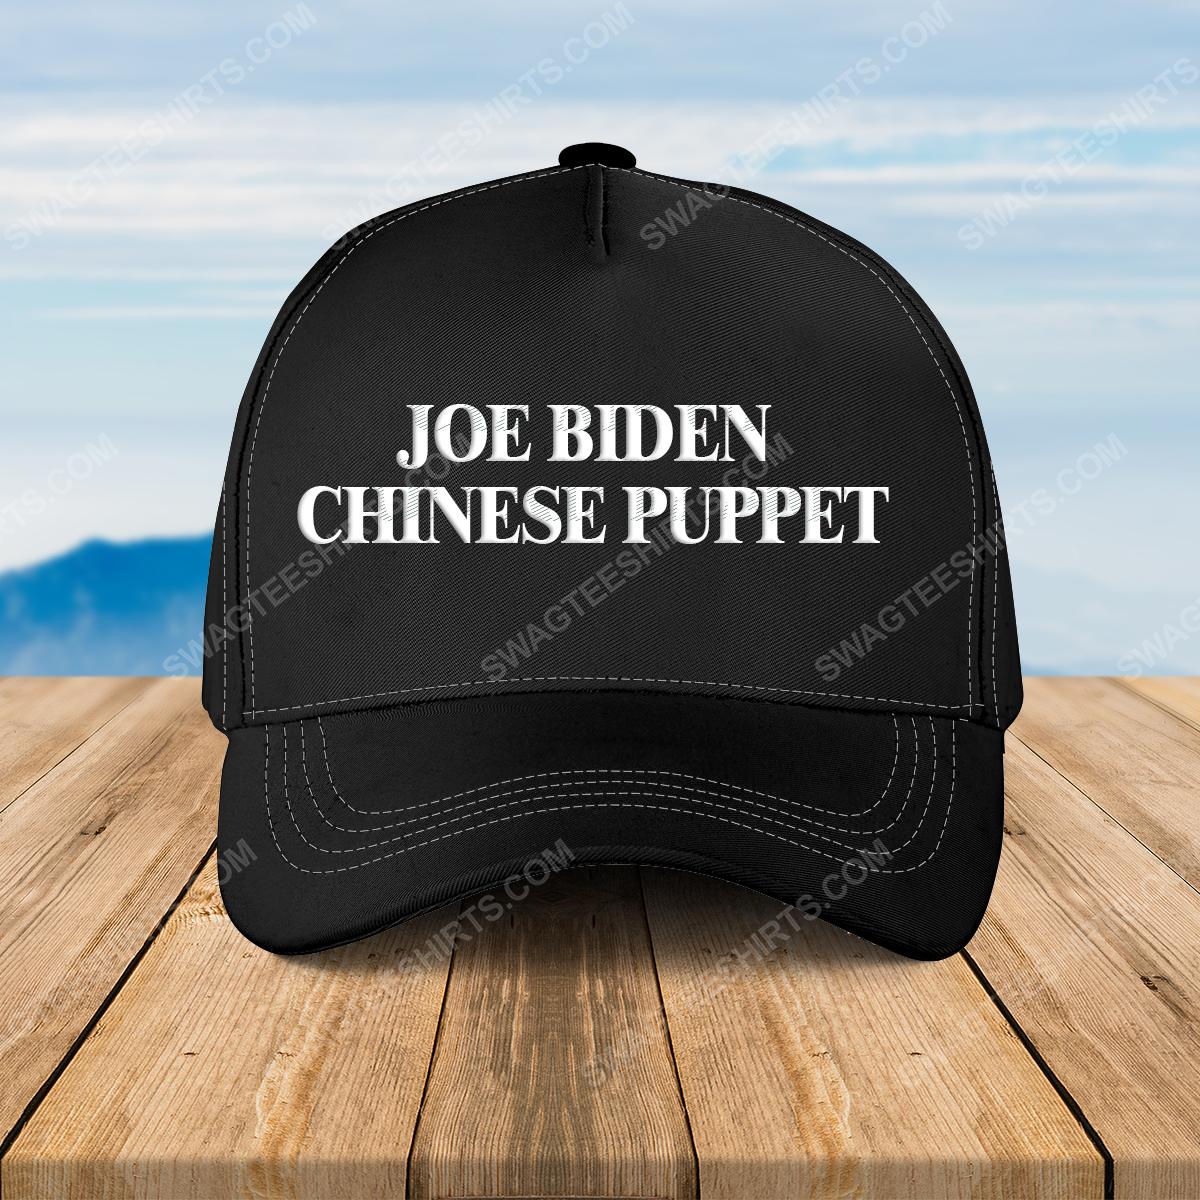 Joe biden chinese puppet full print classic hat 1